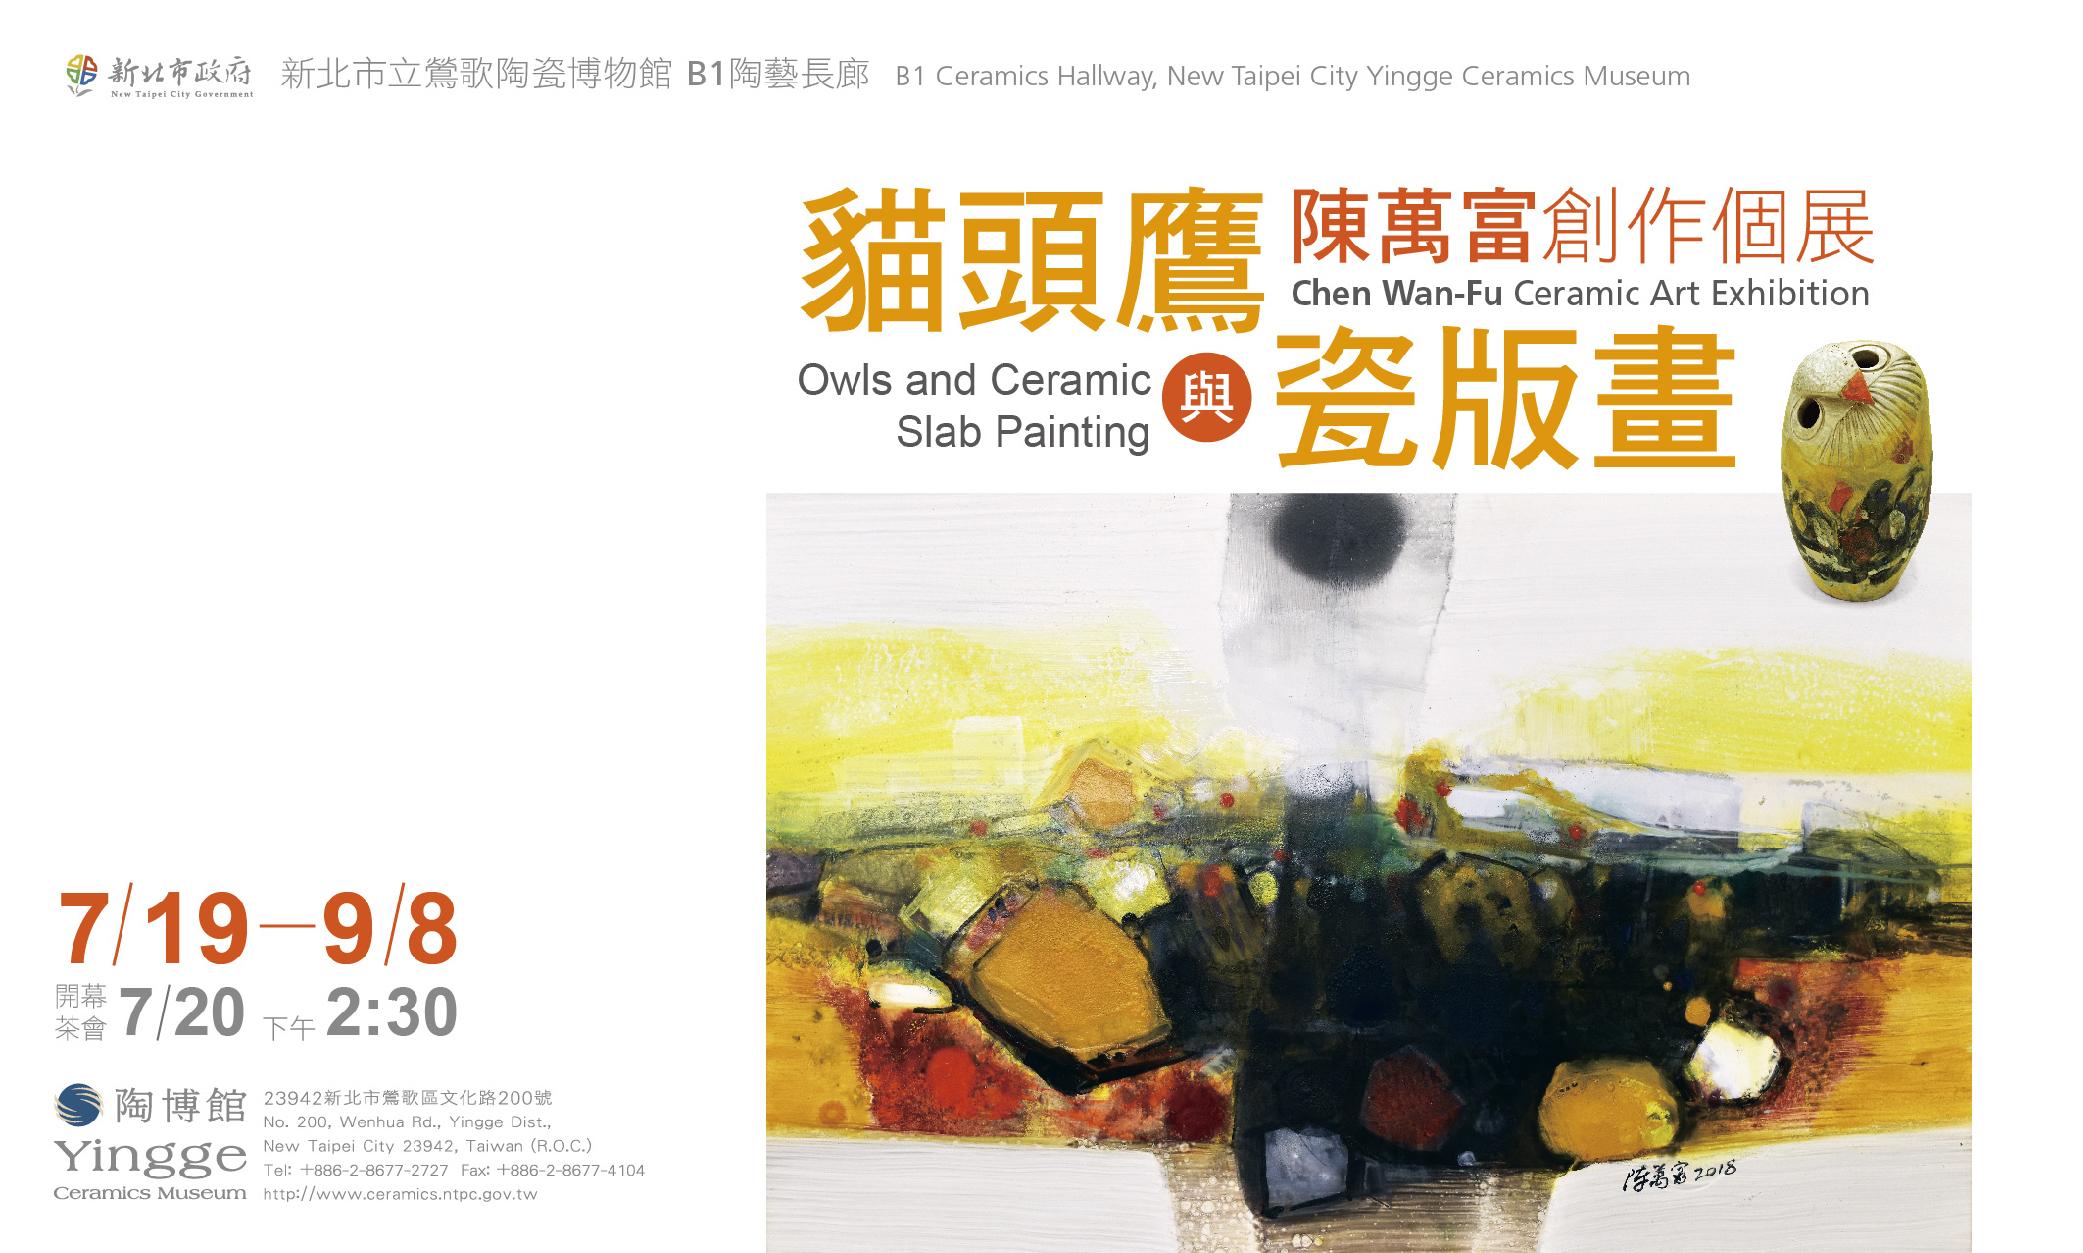 Owls and Ceramic Slab Painting: CHEN Wan-Fu Ceramic Art Exhibition